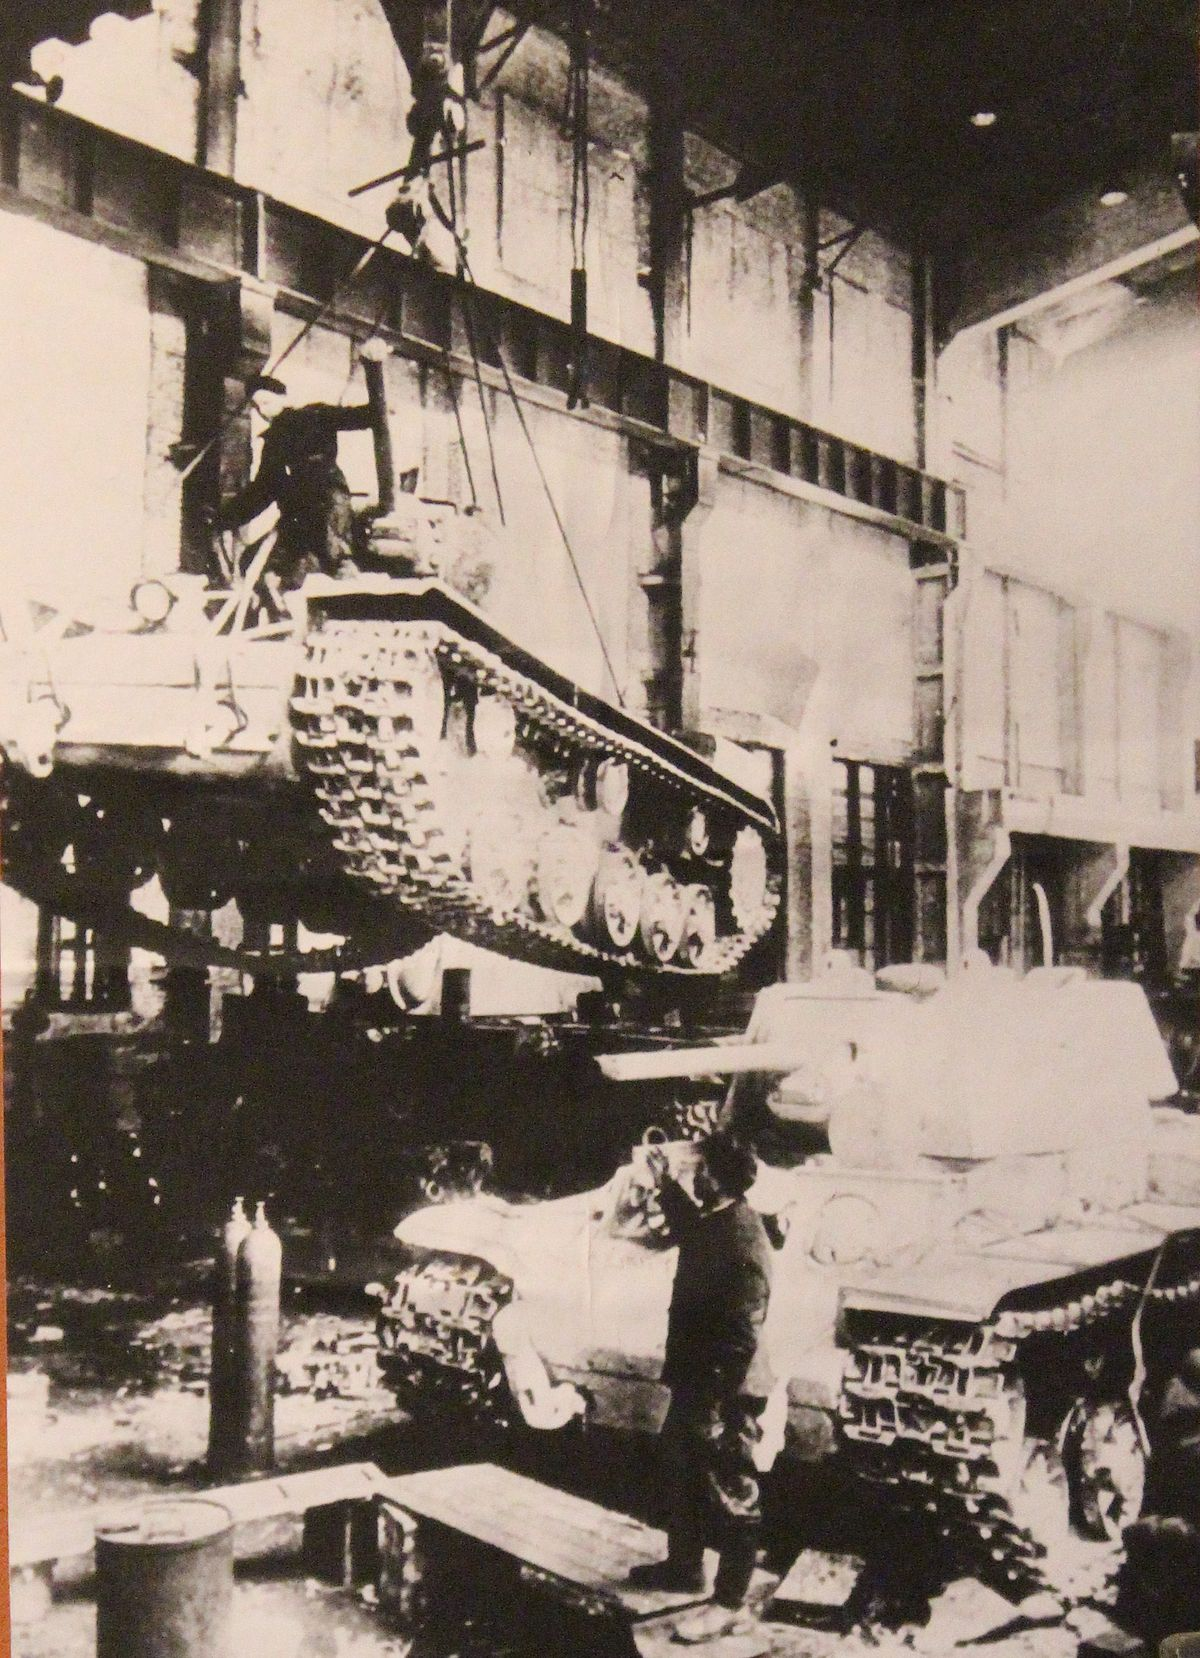 Soviet combat vehicle production during World War II - Wikipedia